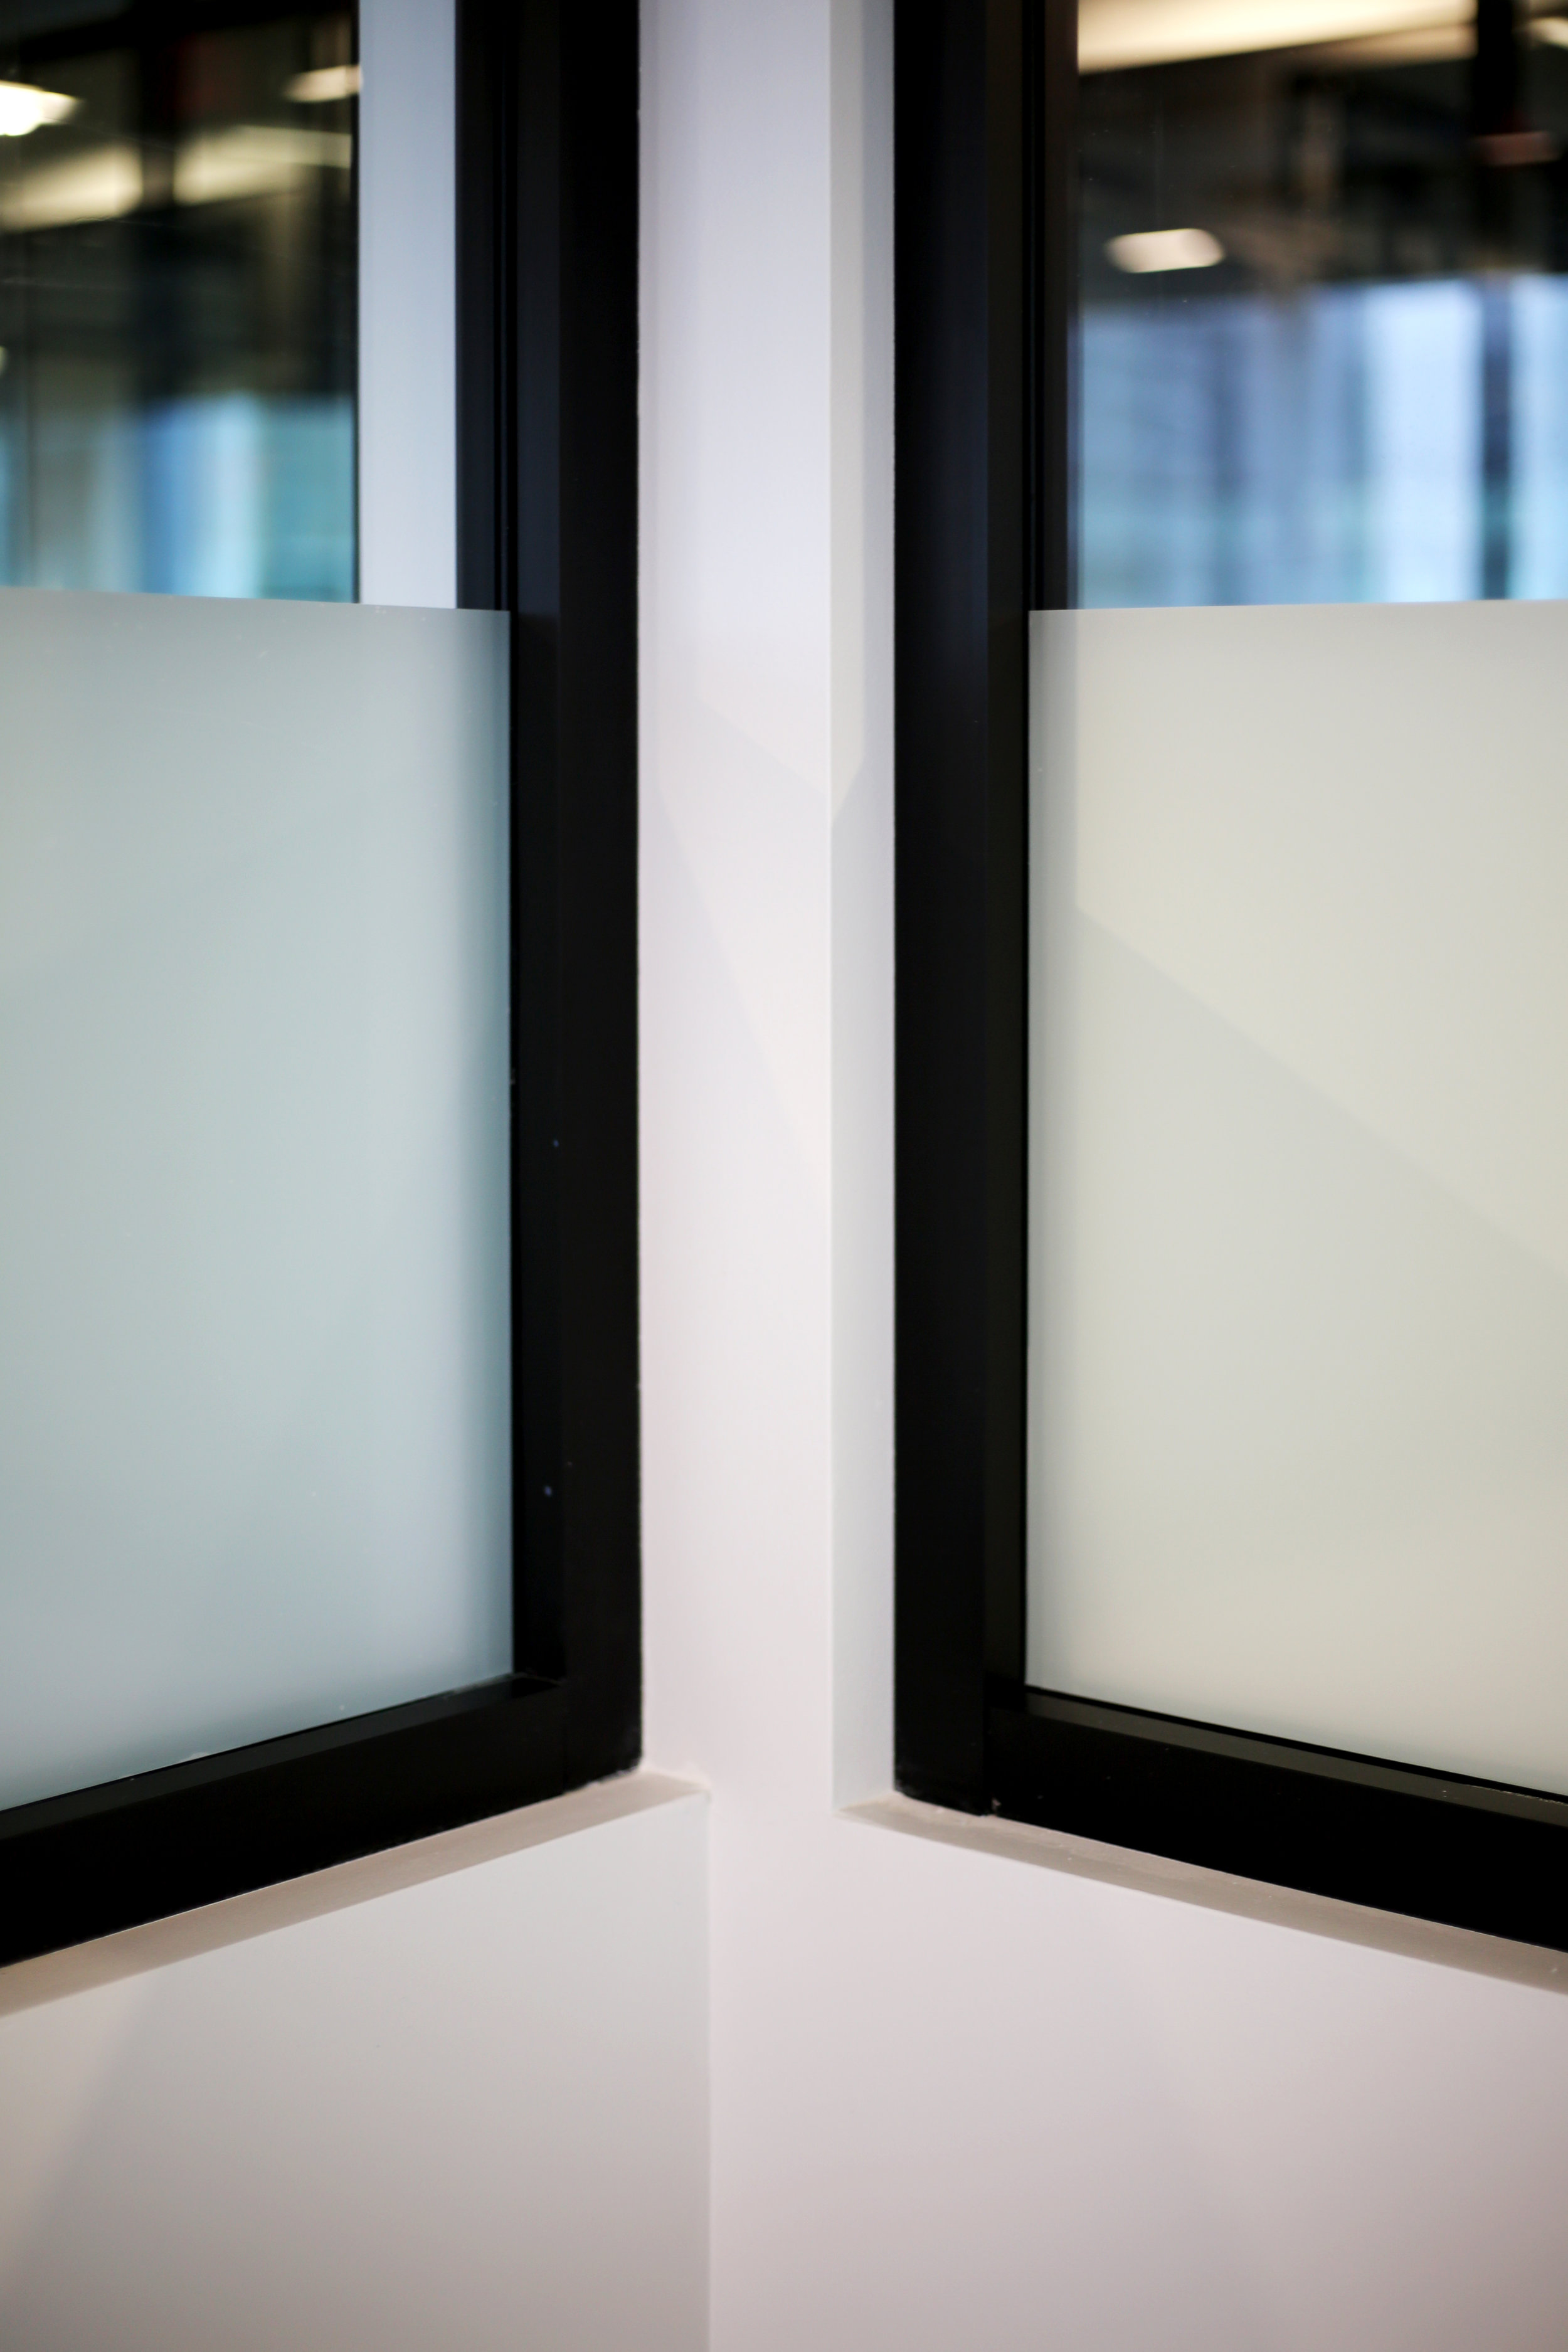 Litespace Black Aluminum Interior Windows - Spaceworks AI.jpg